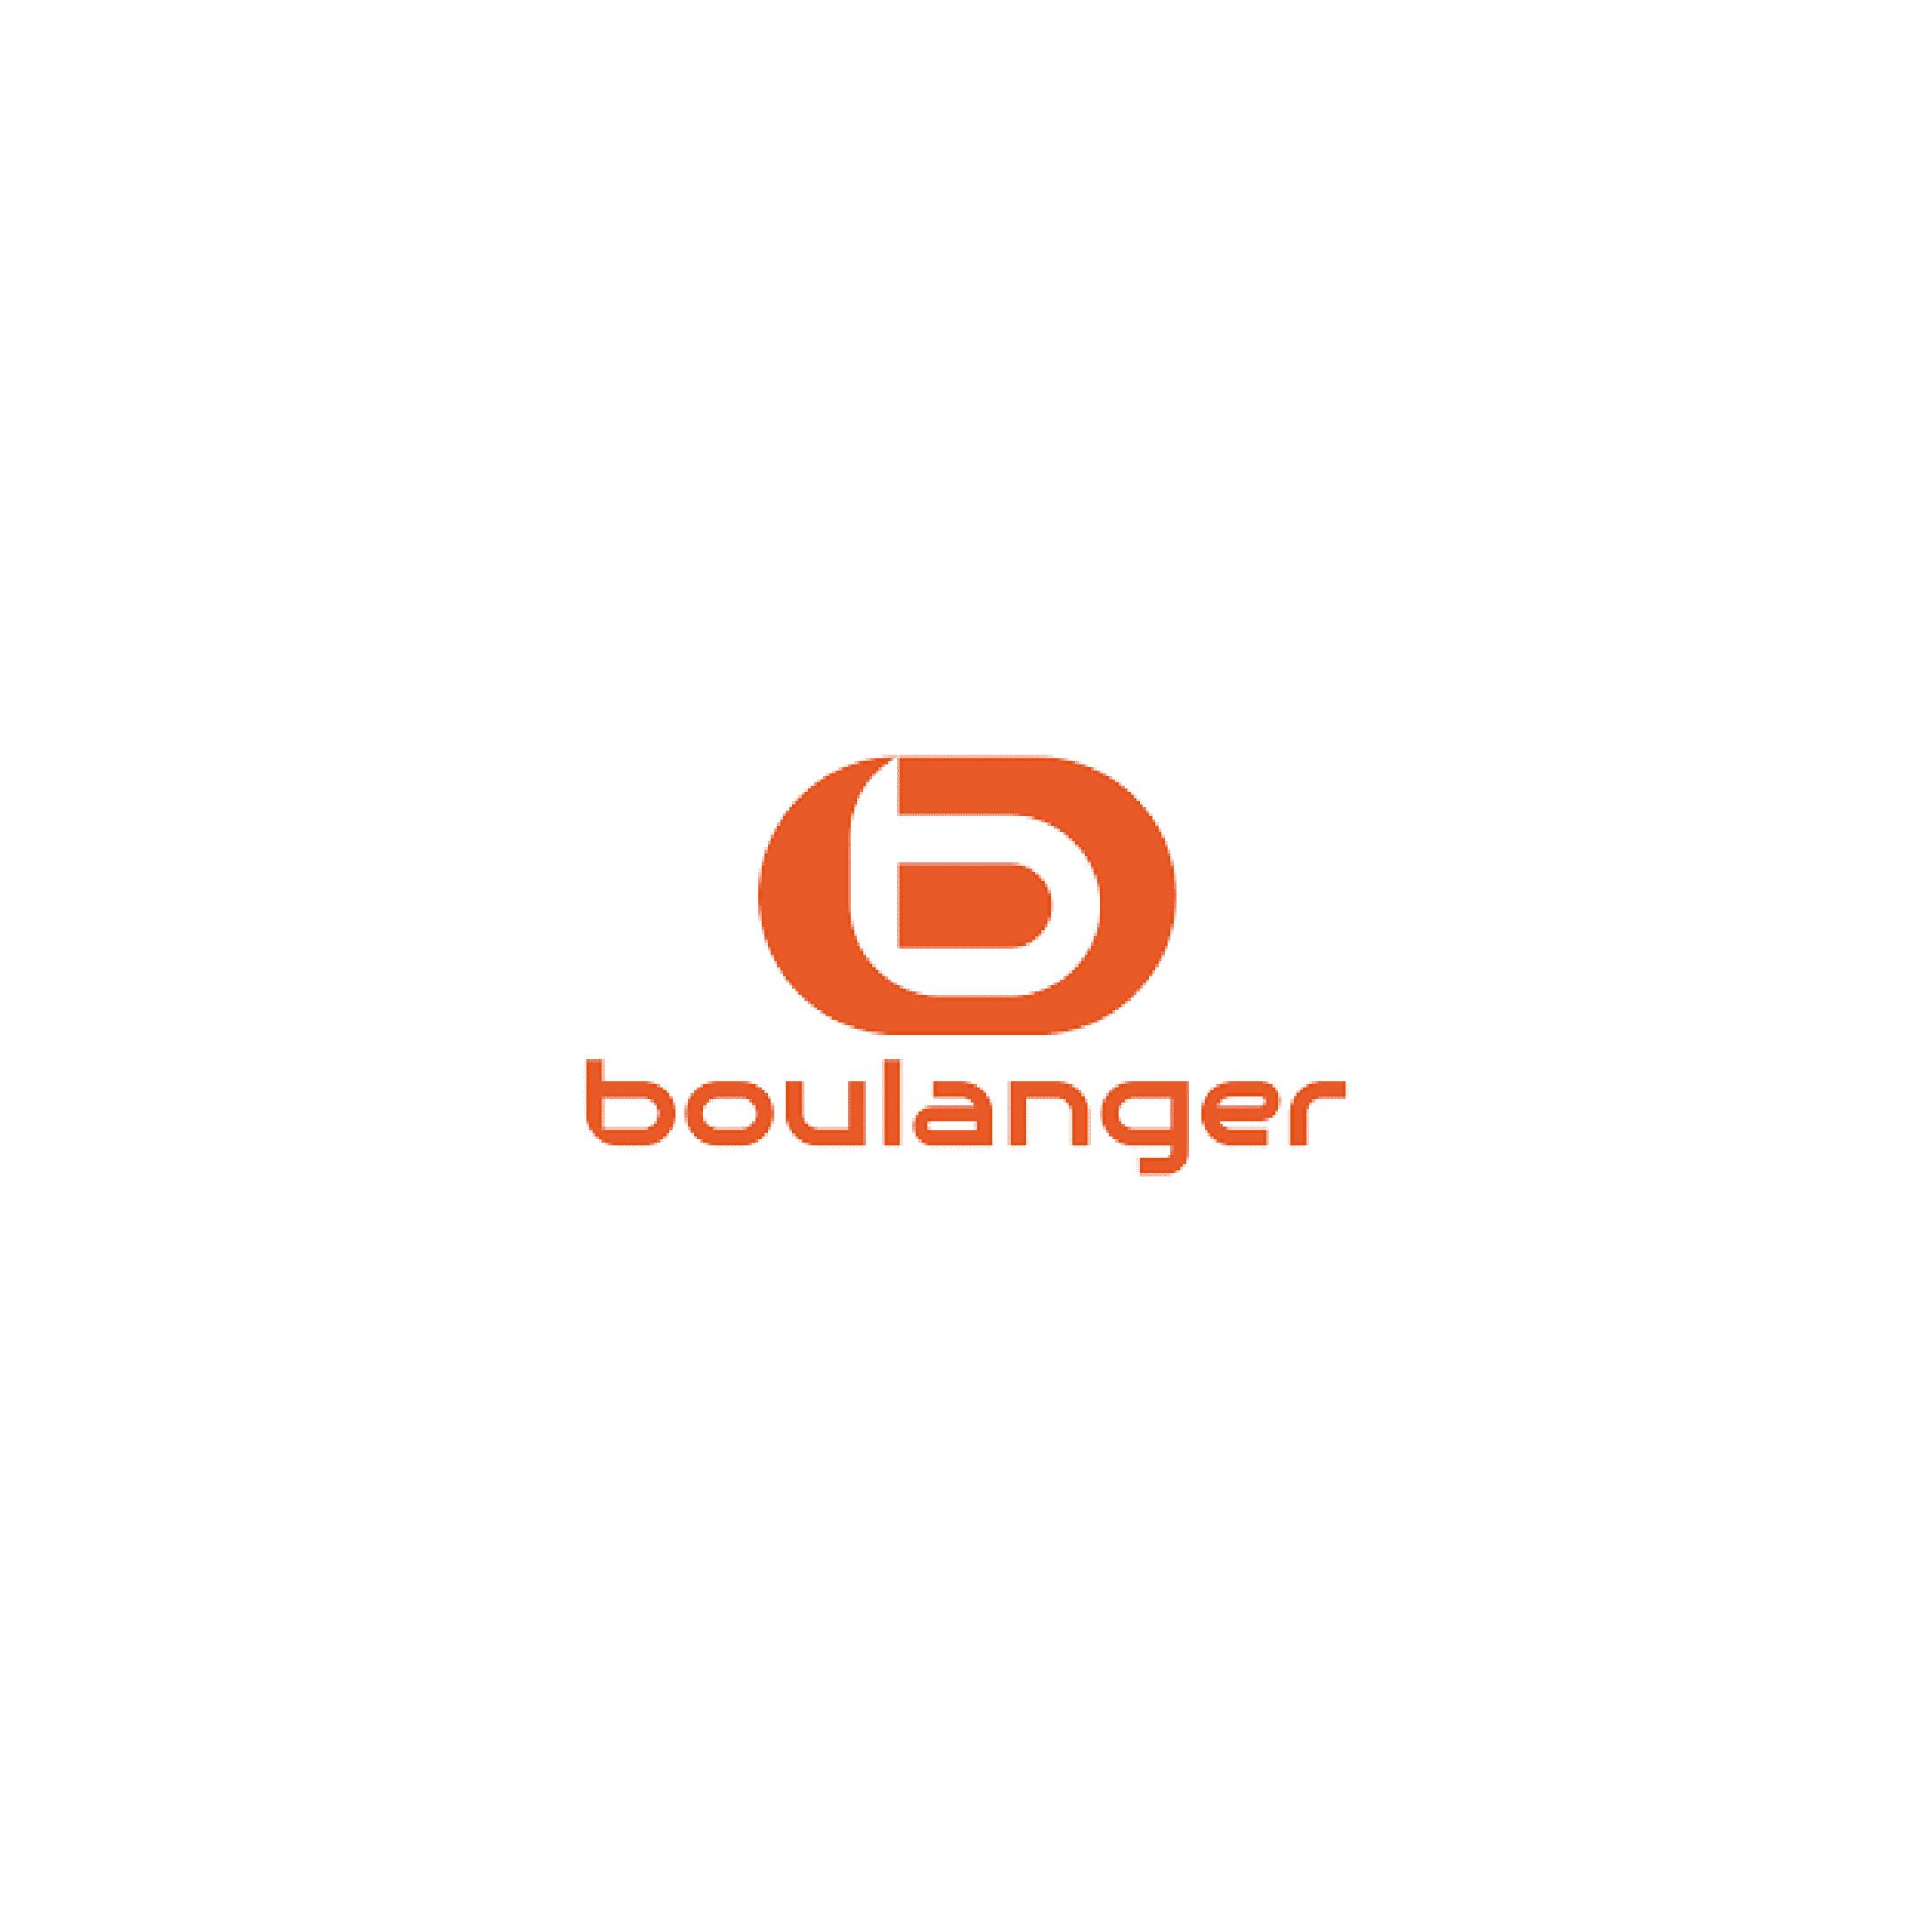 DialOnce-Boulanger